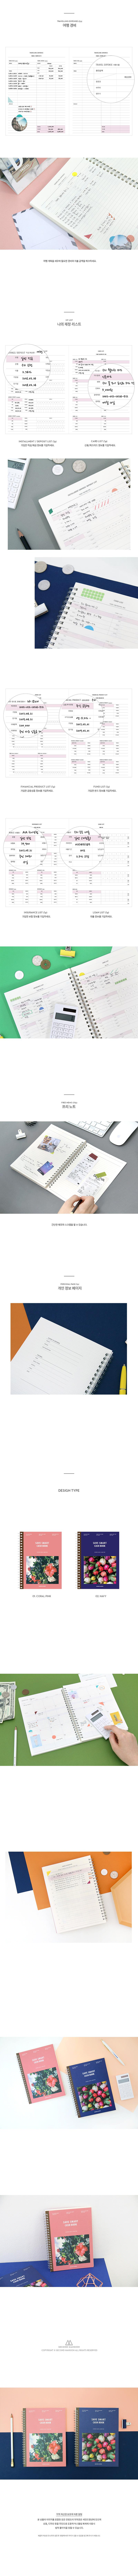 CASH BOOK - 세컨드맨션, 9,800원, 플래너, 가계부